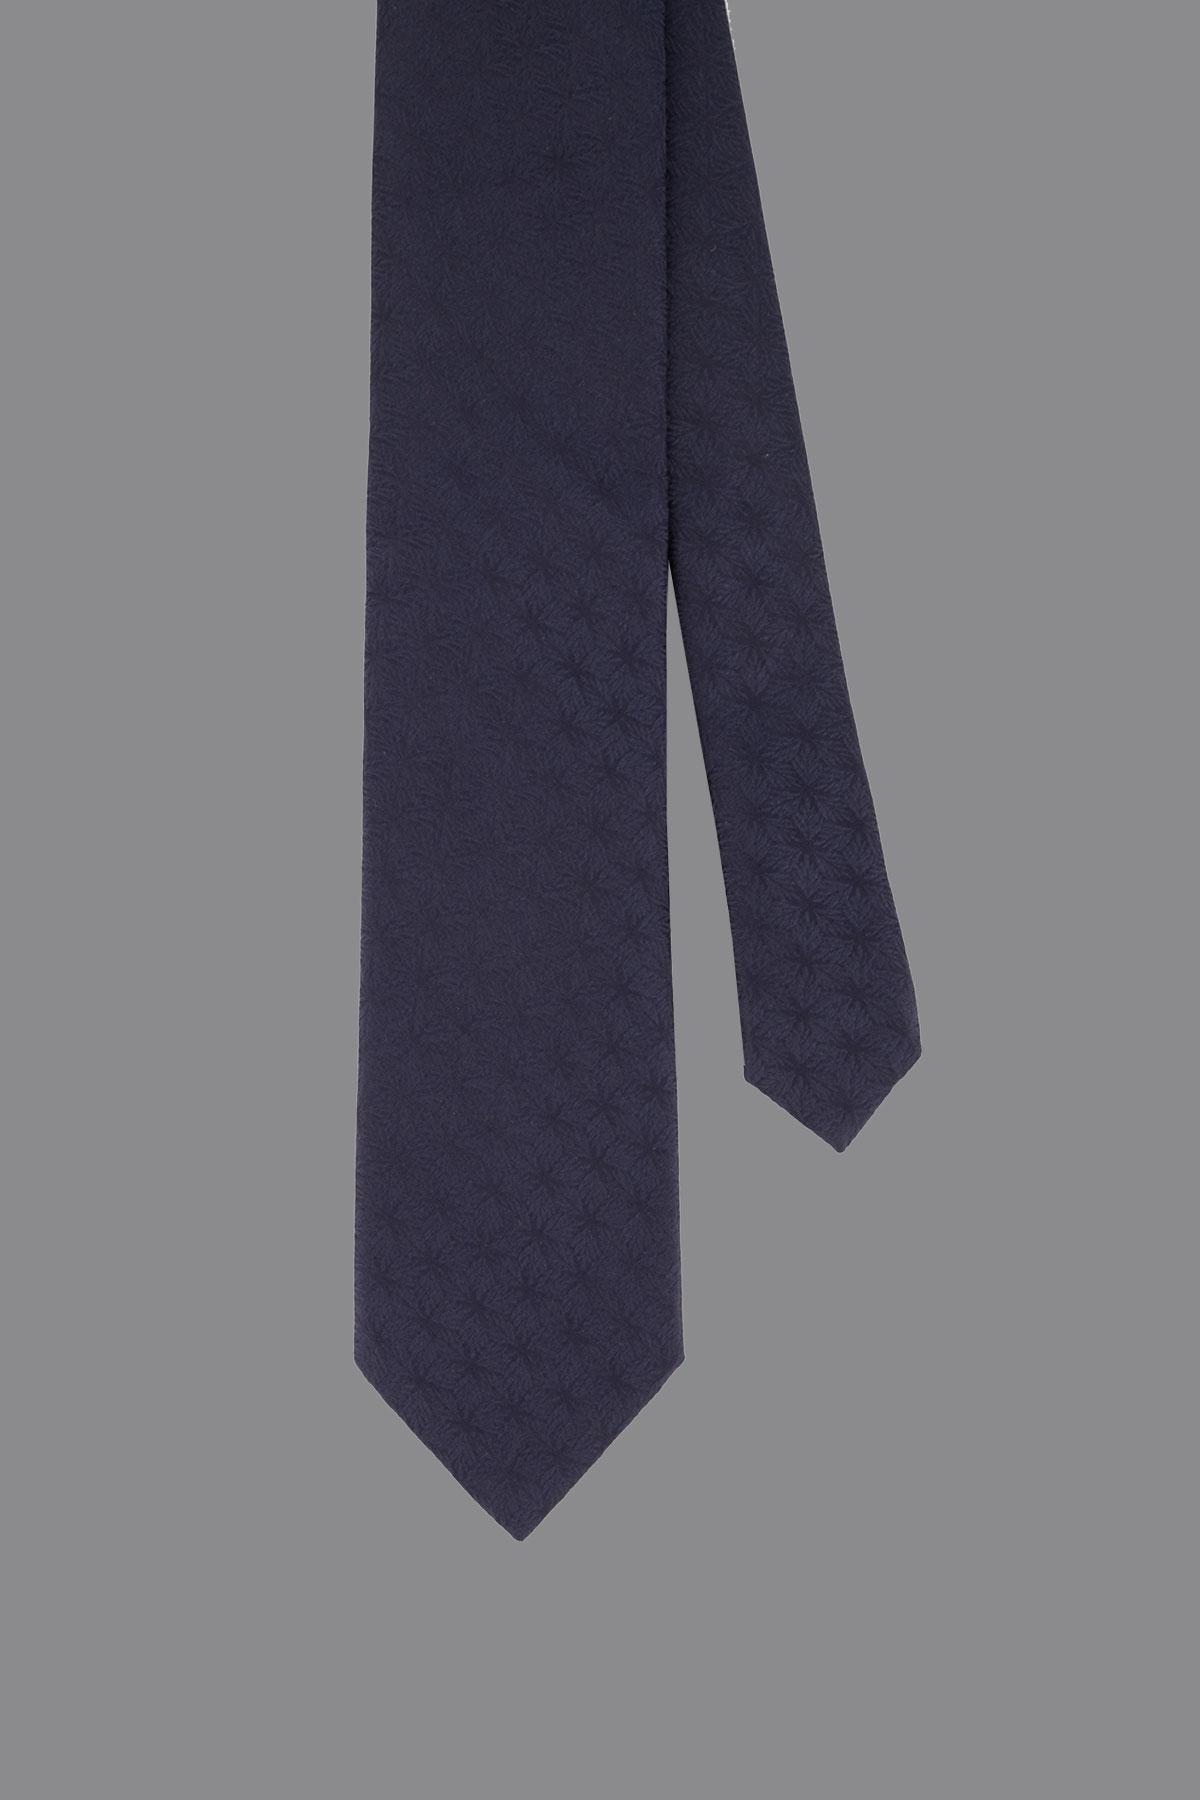 Corbata CANALI color Morado